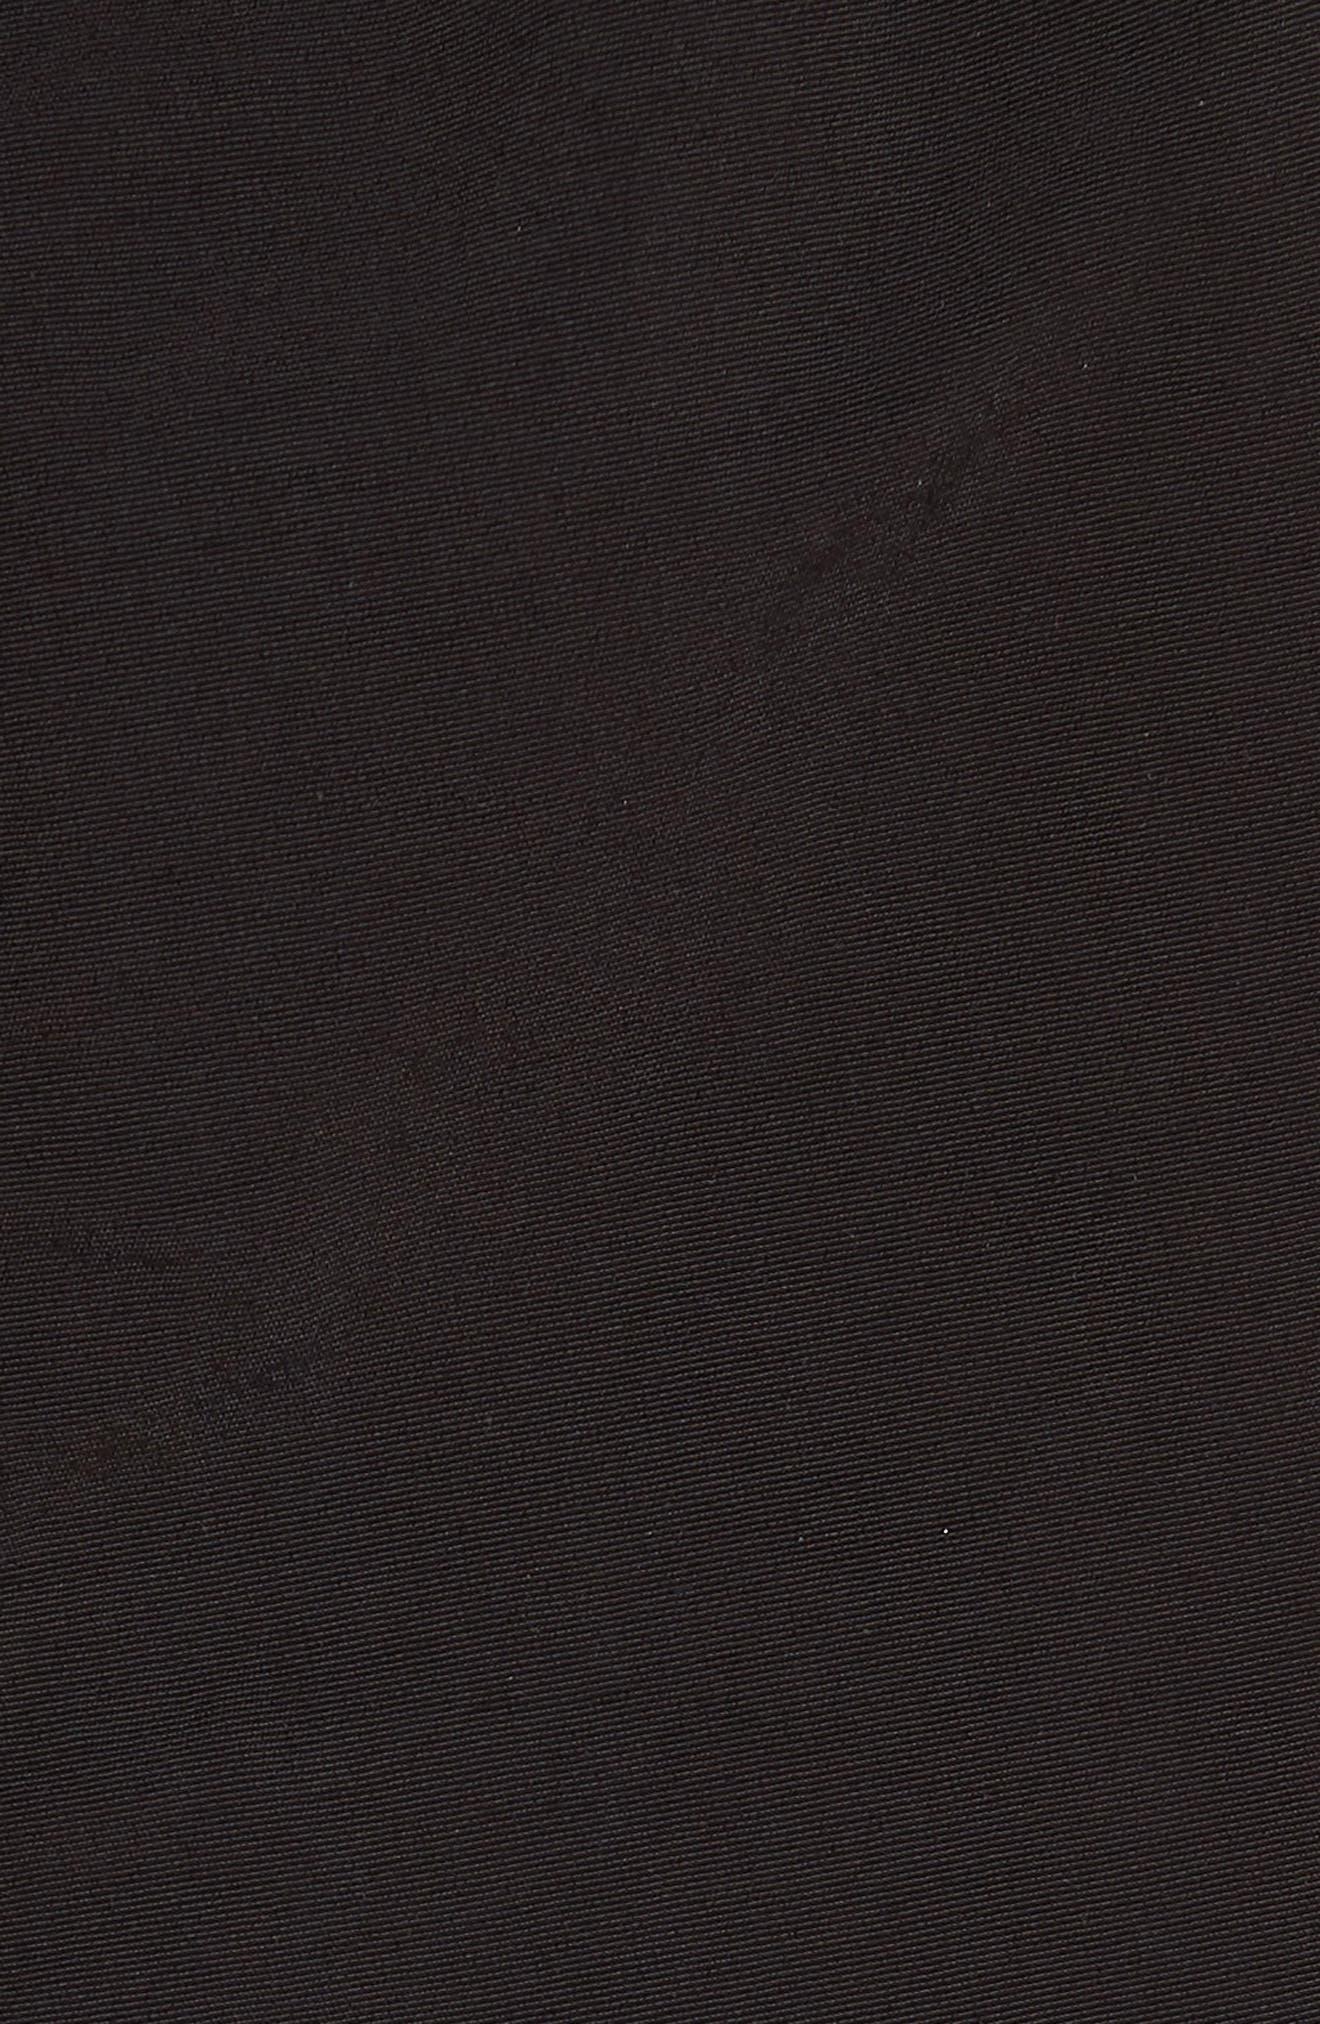 Baggies 7-Inch Swim Trunks,                             Alternate thumbnail 5, color,                             BLACK